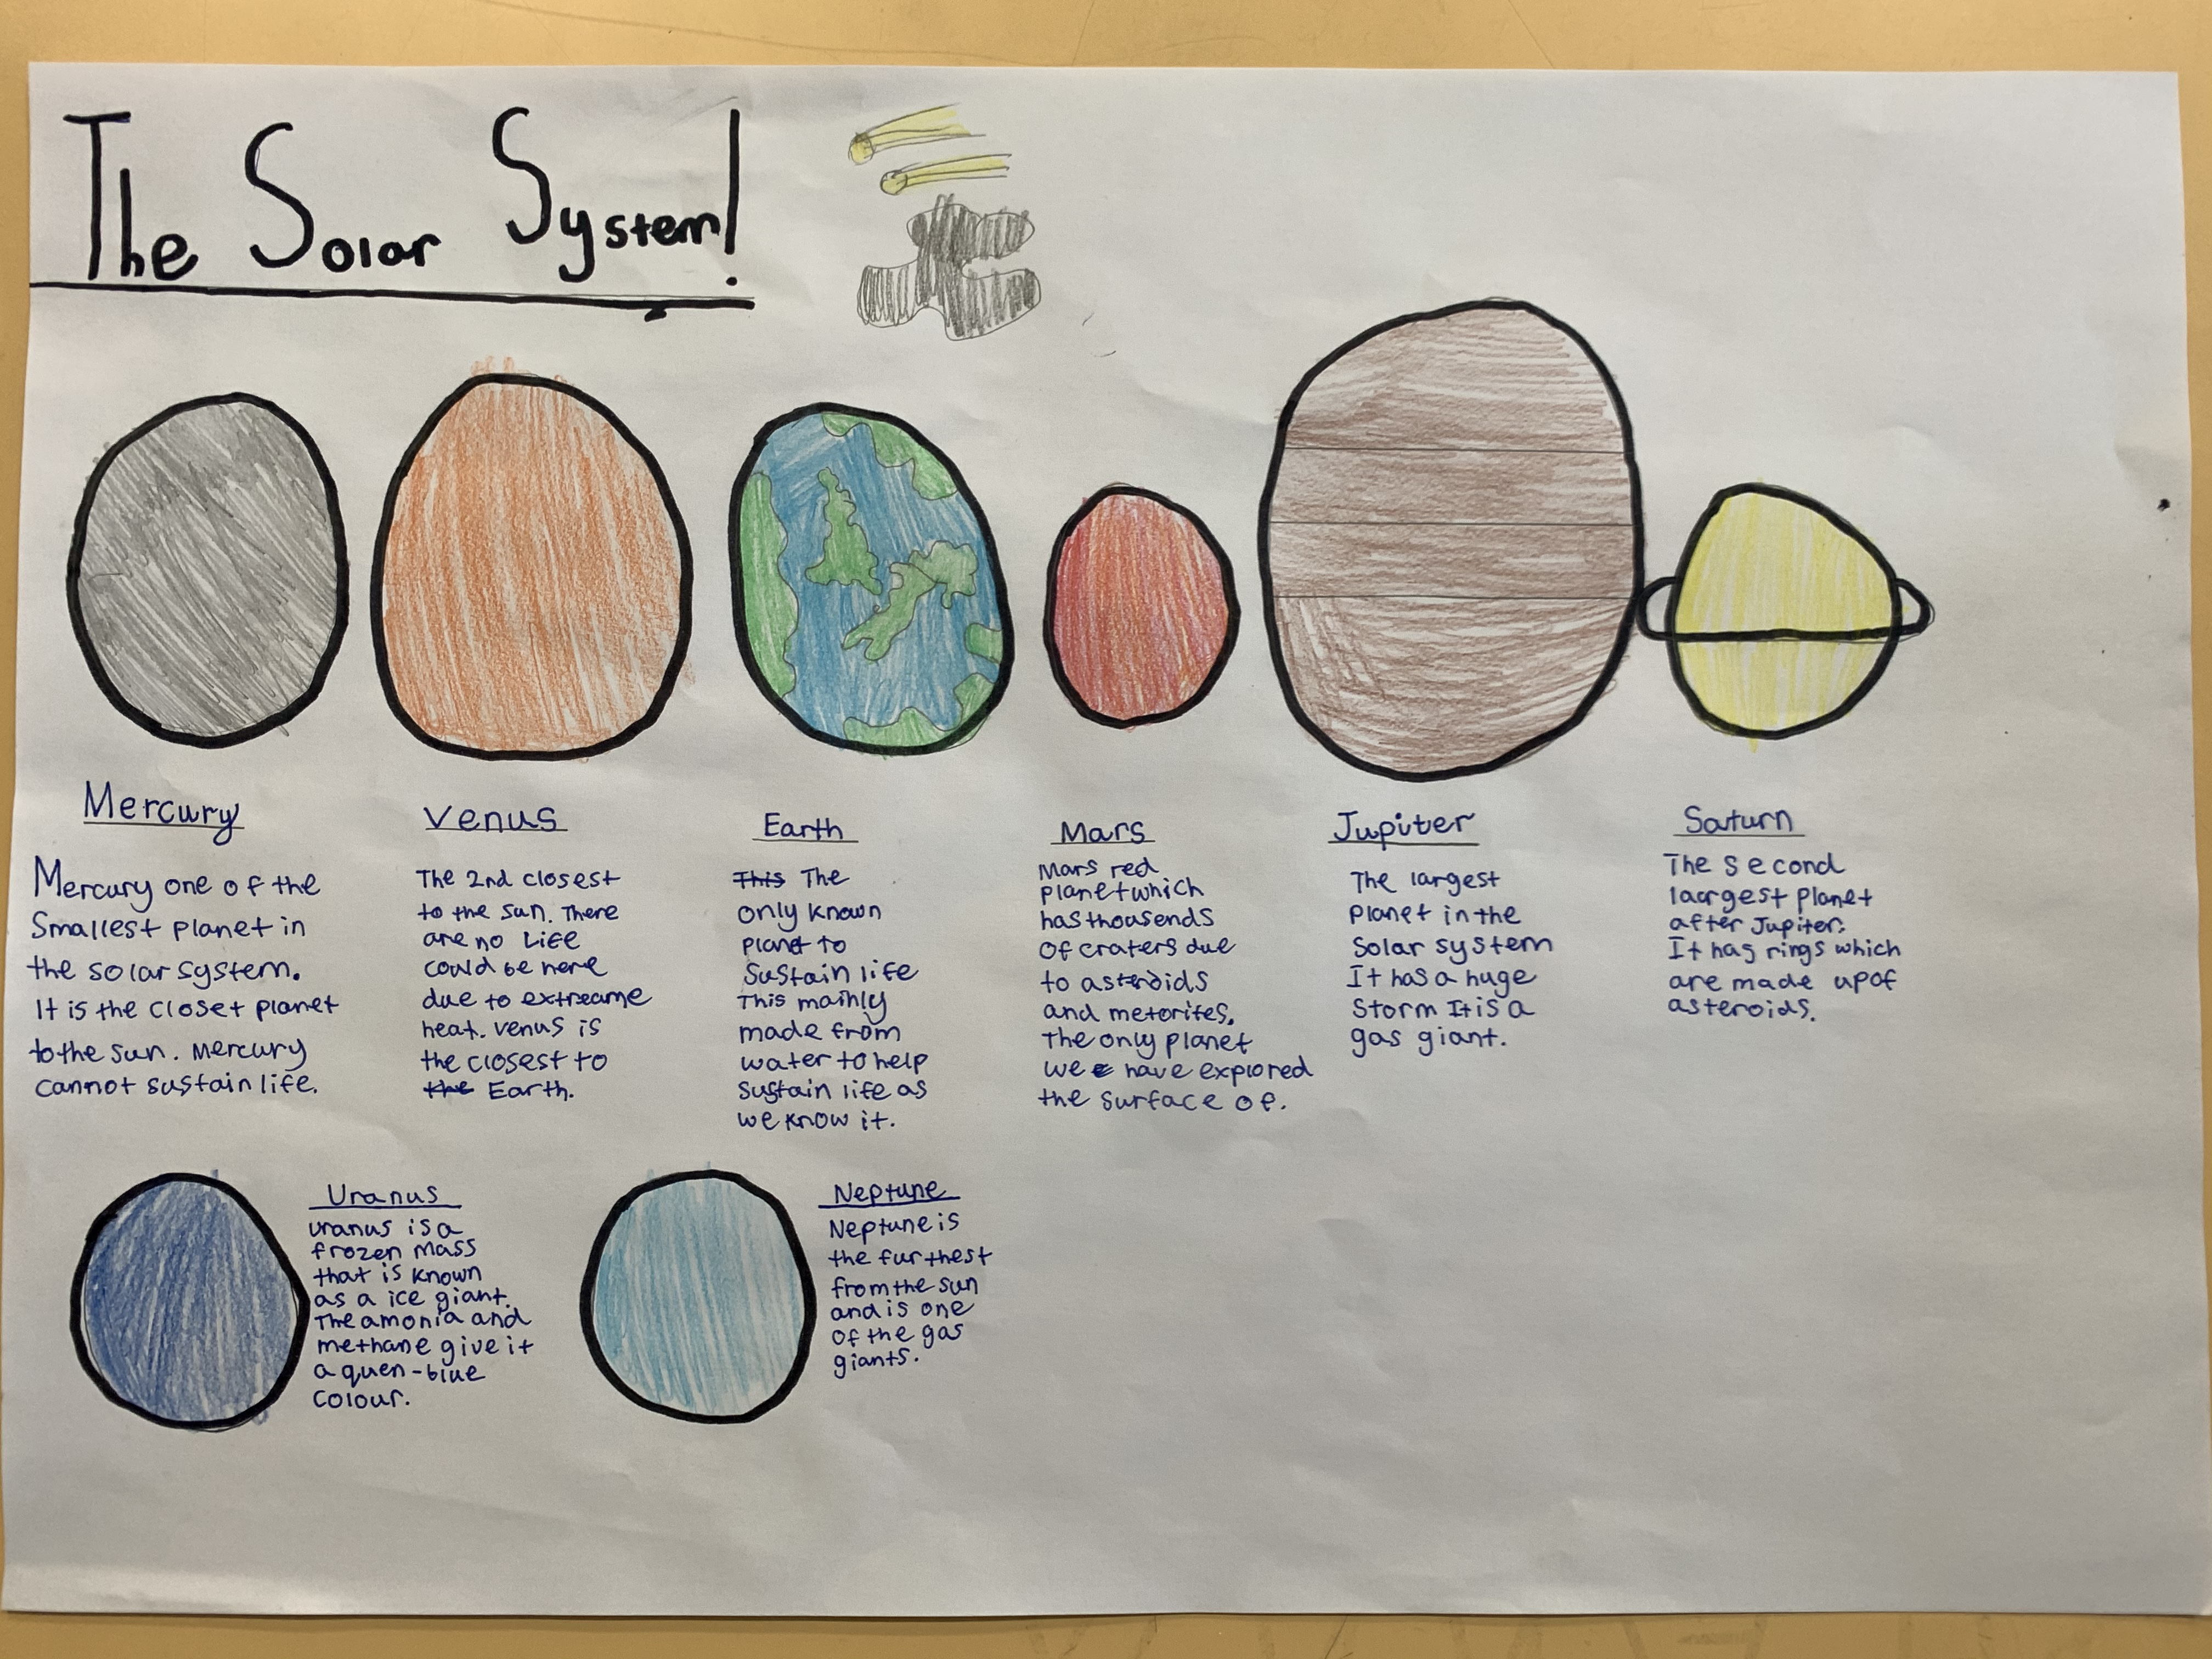 Rene's solar system!